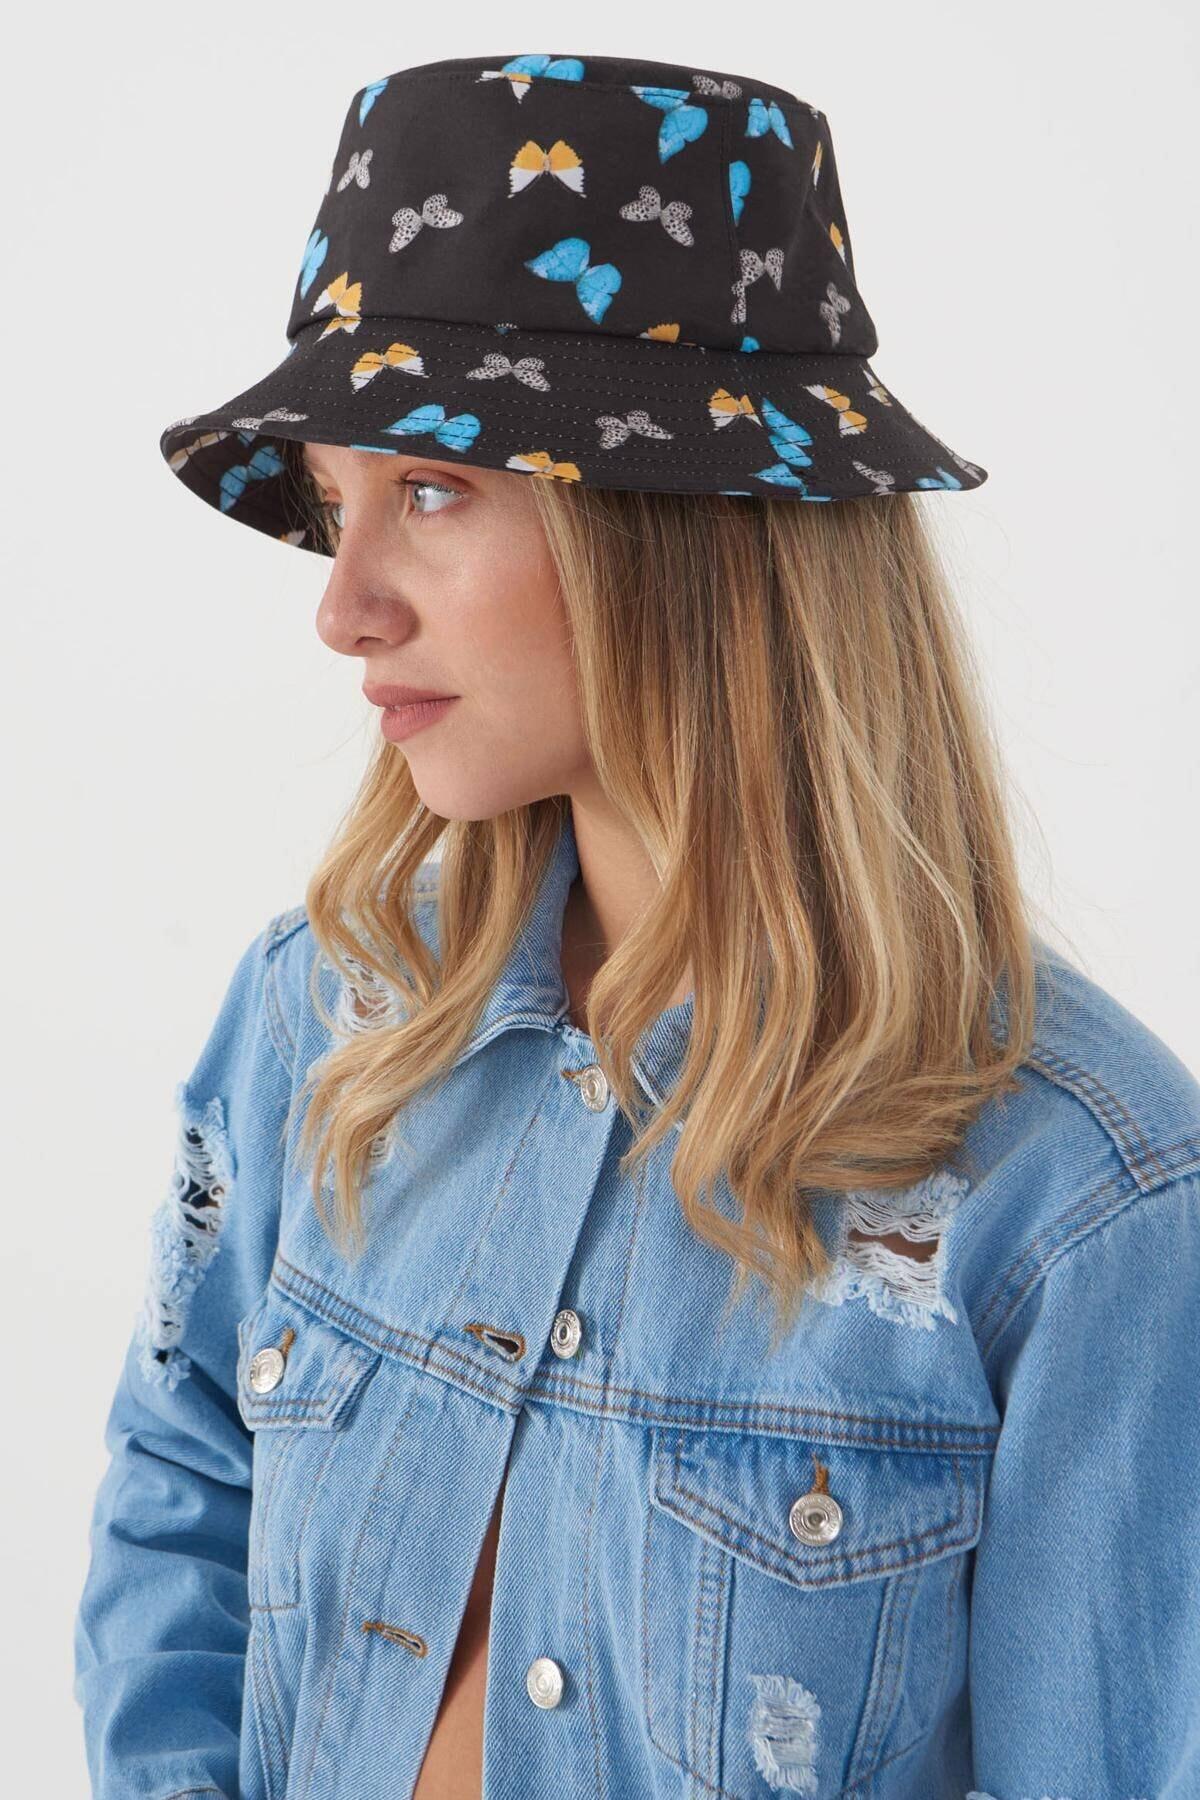 Addax Kadın Siyah Mavi Şapka Şpk1045 - E1 Adx-0000023856 0